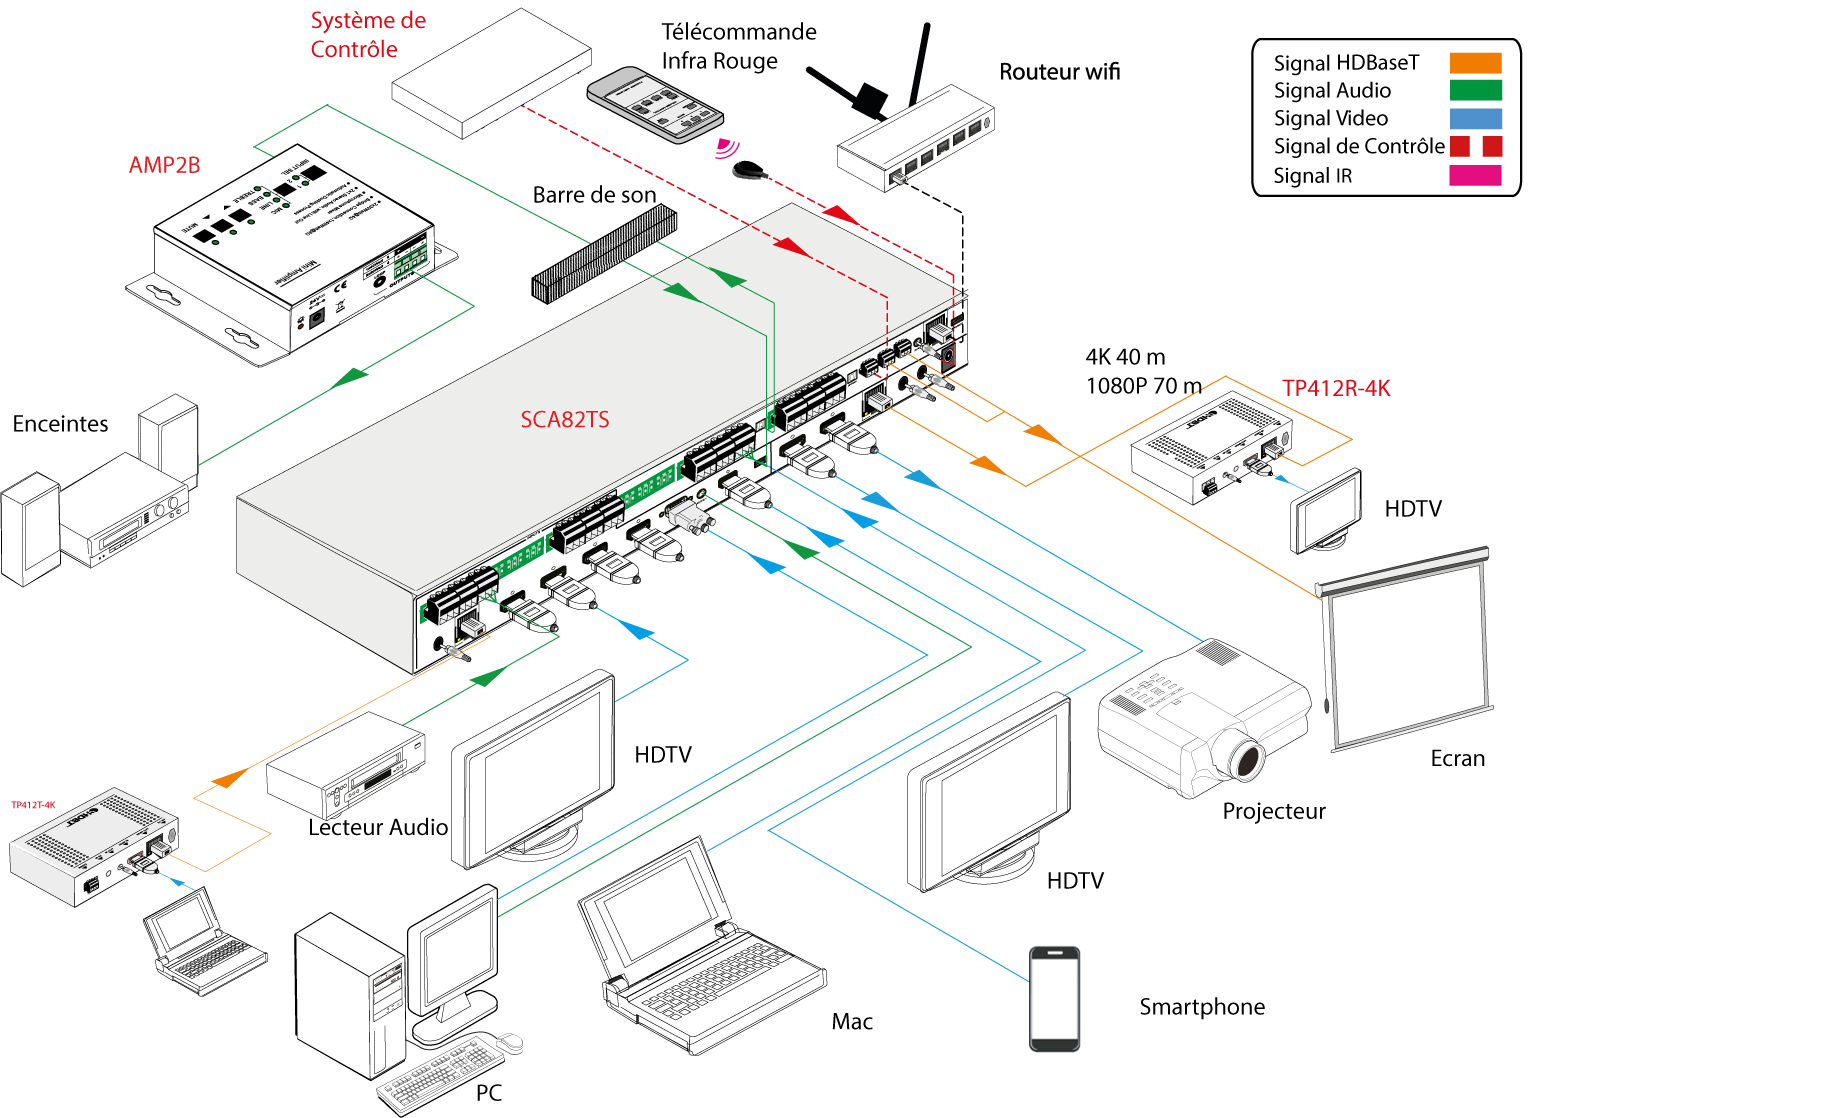 SCA82TS - Scaler seamless 4K@60Hz 4:4:4 40m HDMI2.0